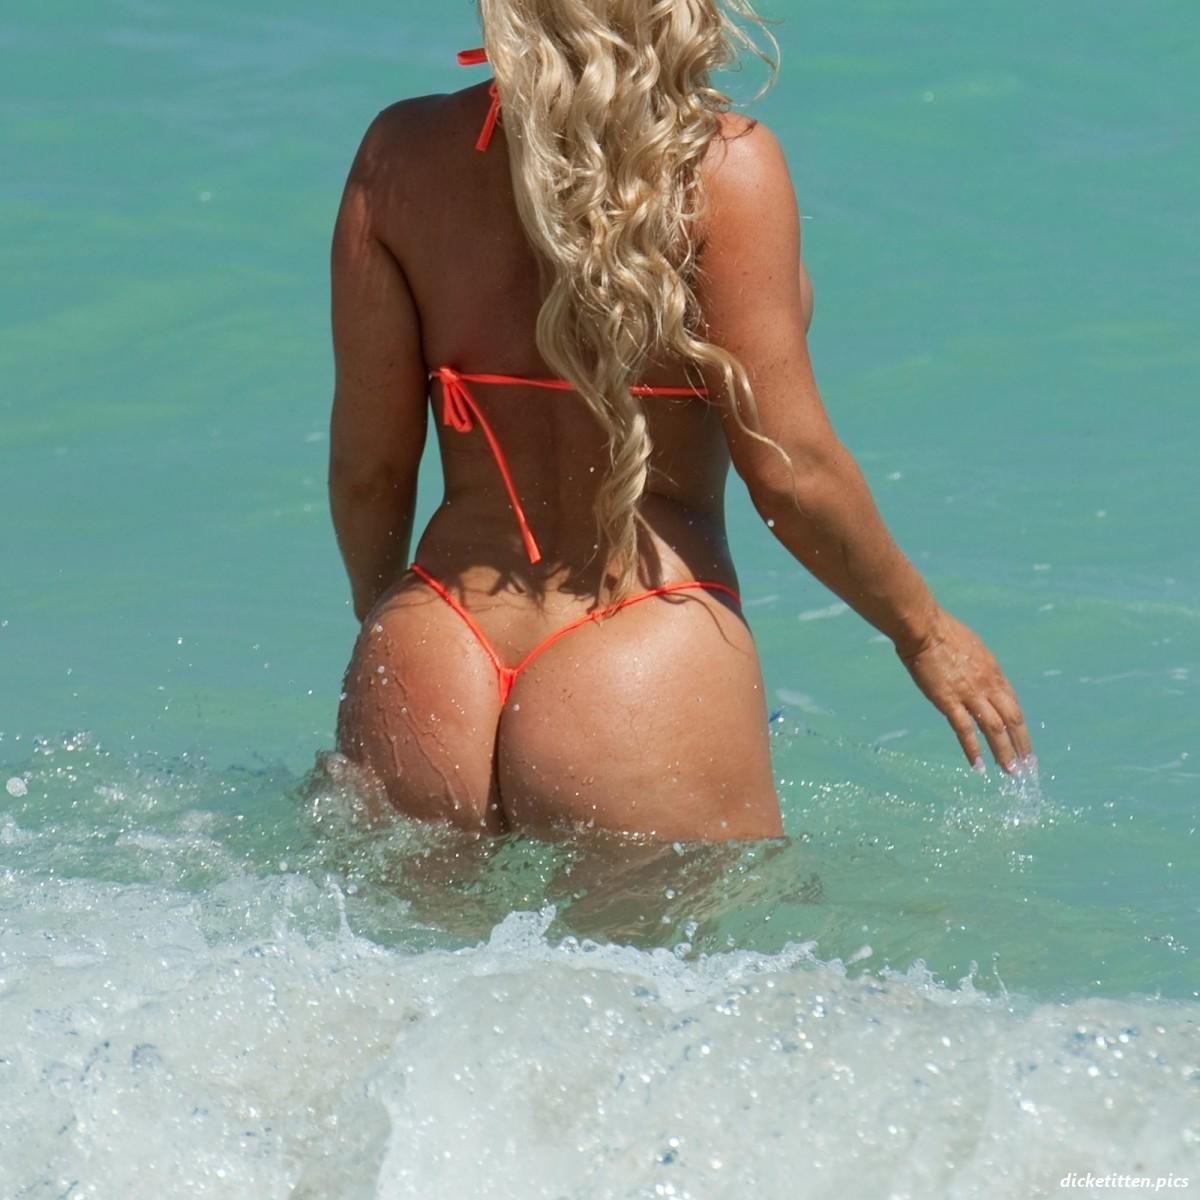 Президент Хорватии: фото в купальнике на пляже (15 фото)